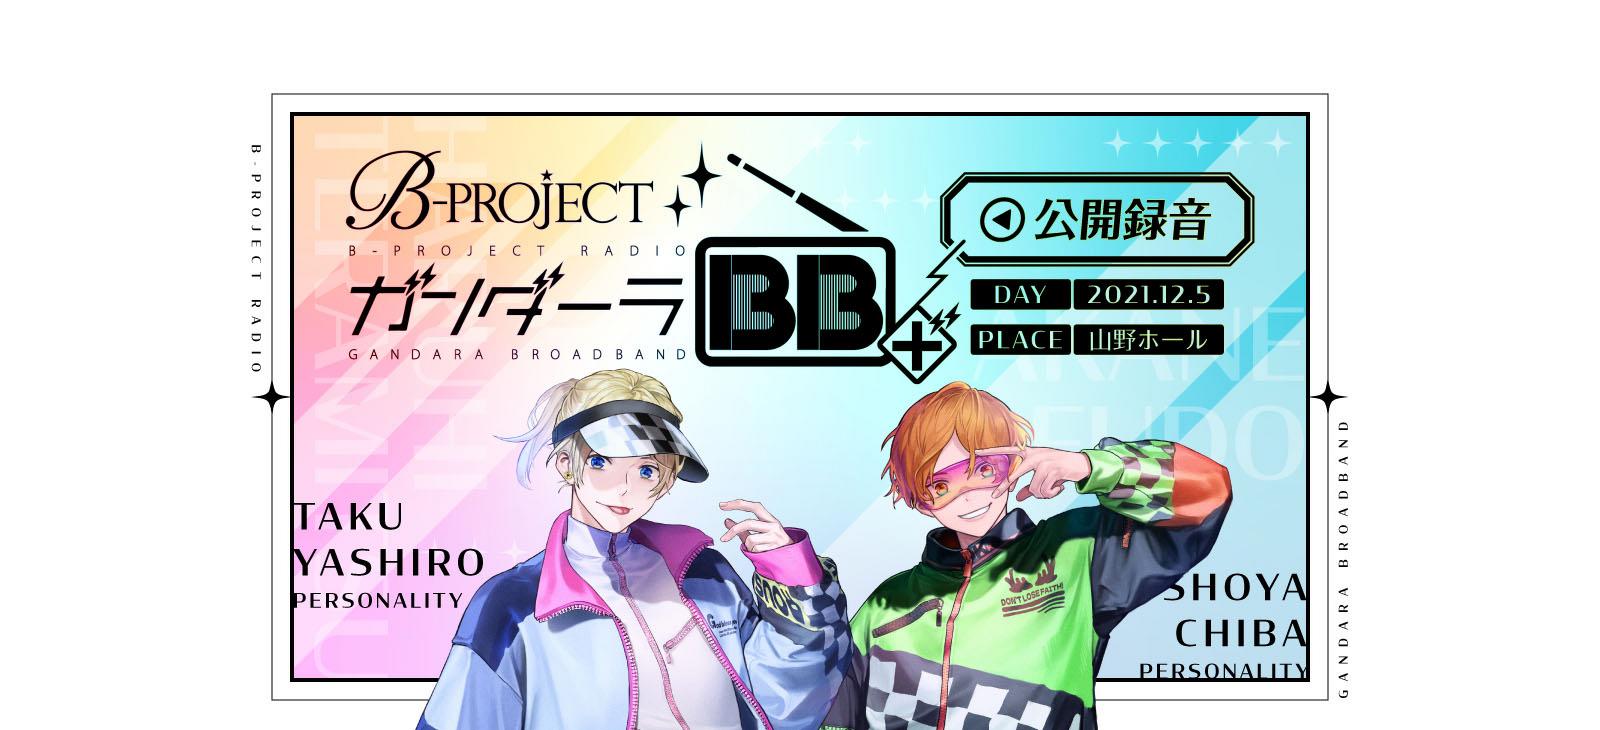 B-PROJECT 6th Anniversary GANDARA BB+ Public Recording Banner.png